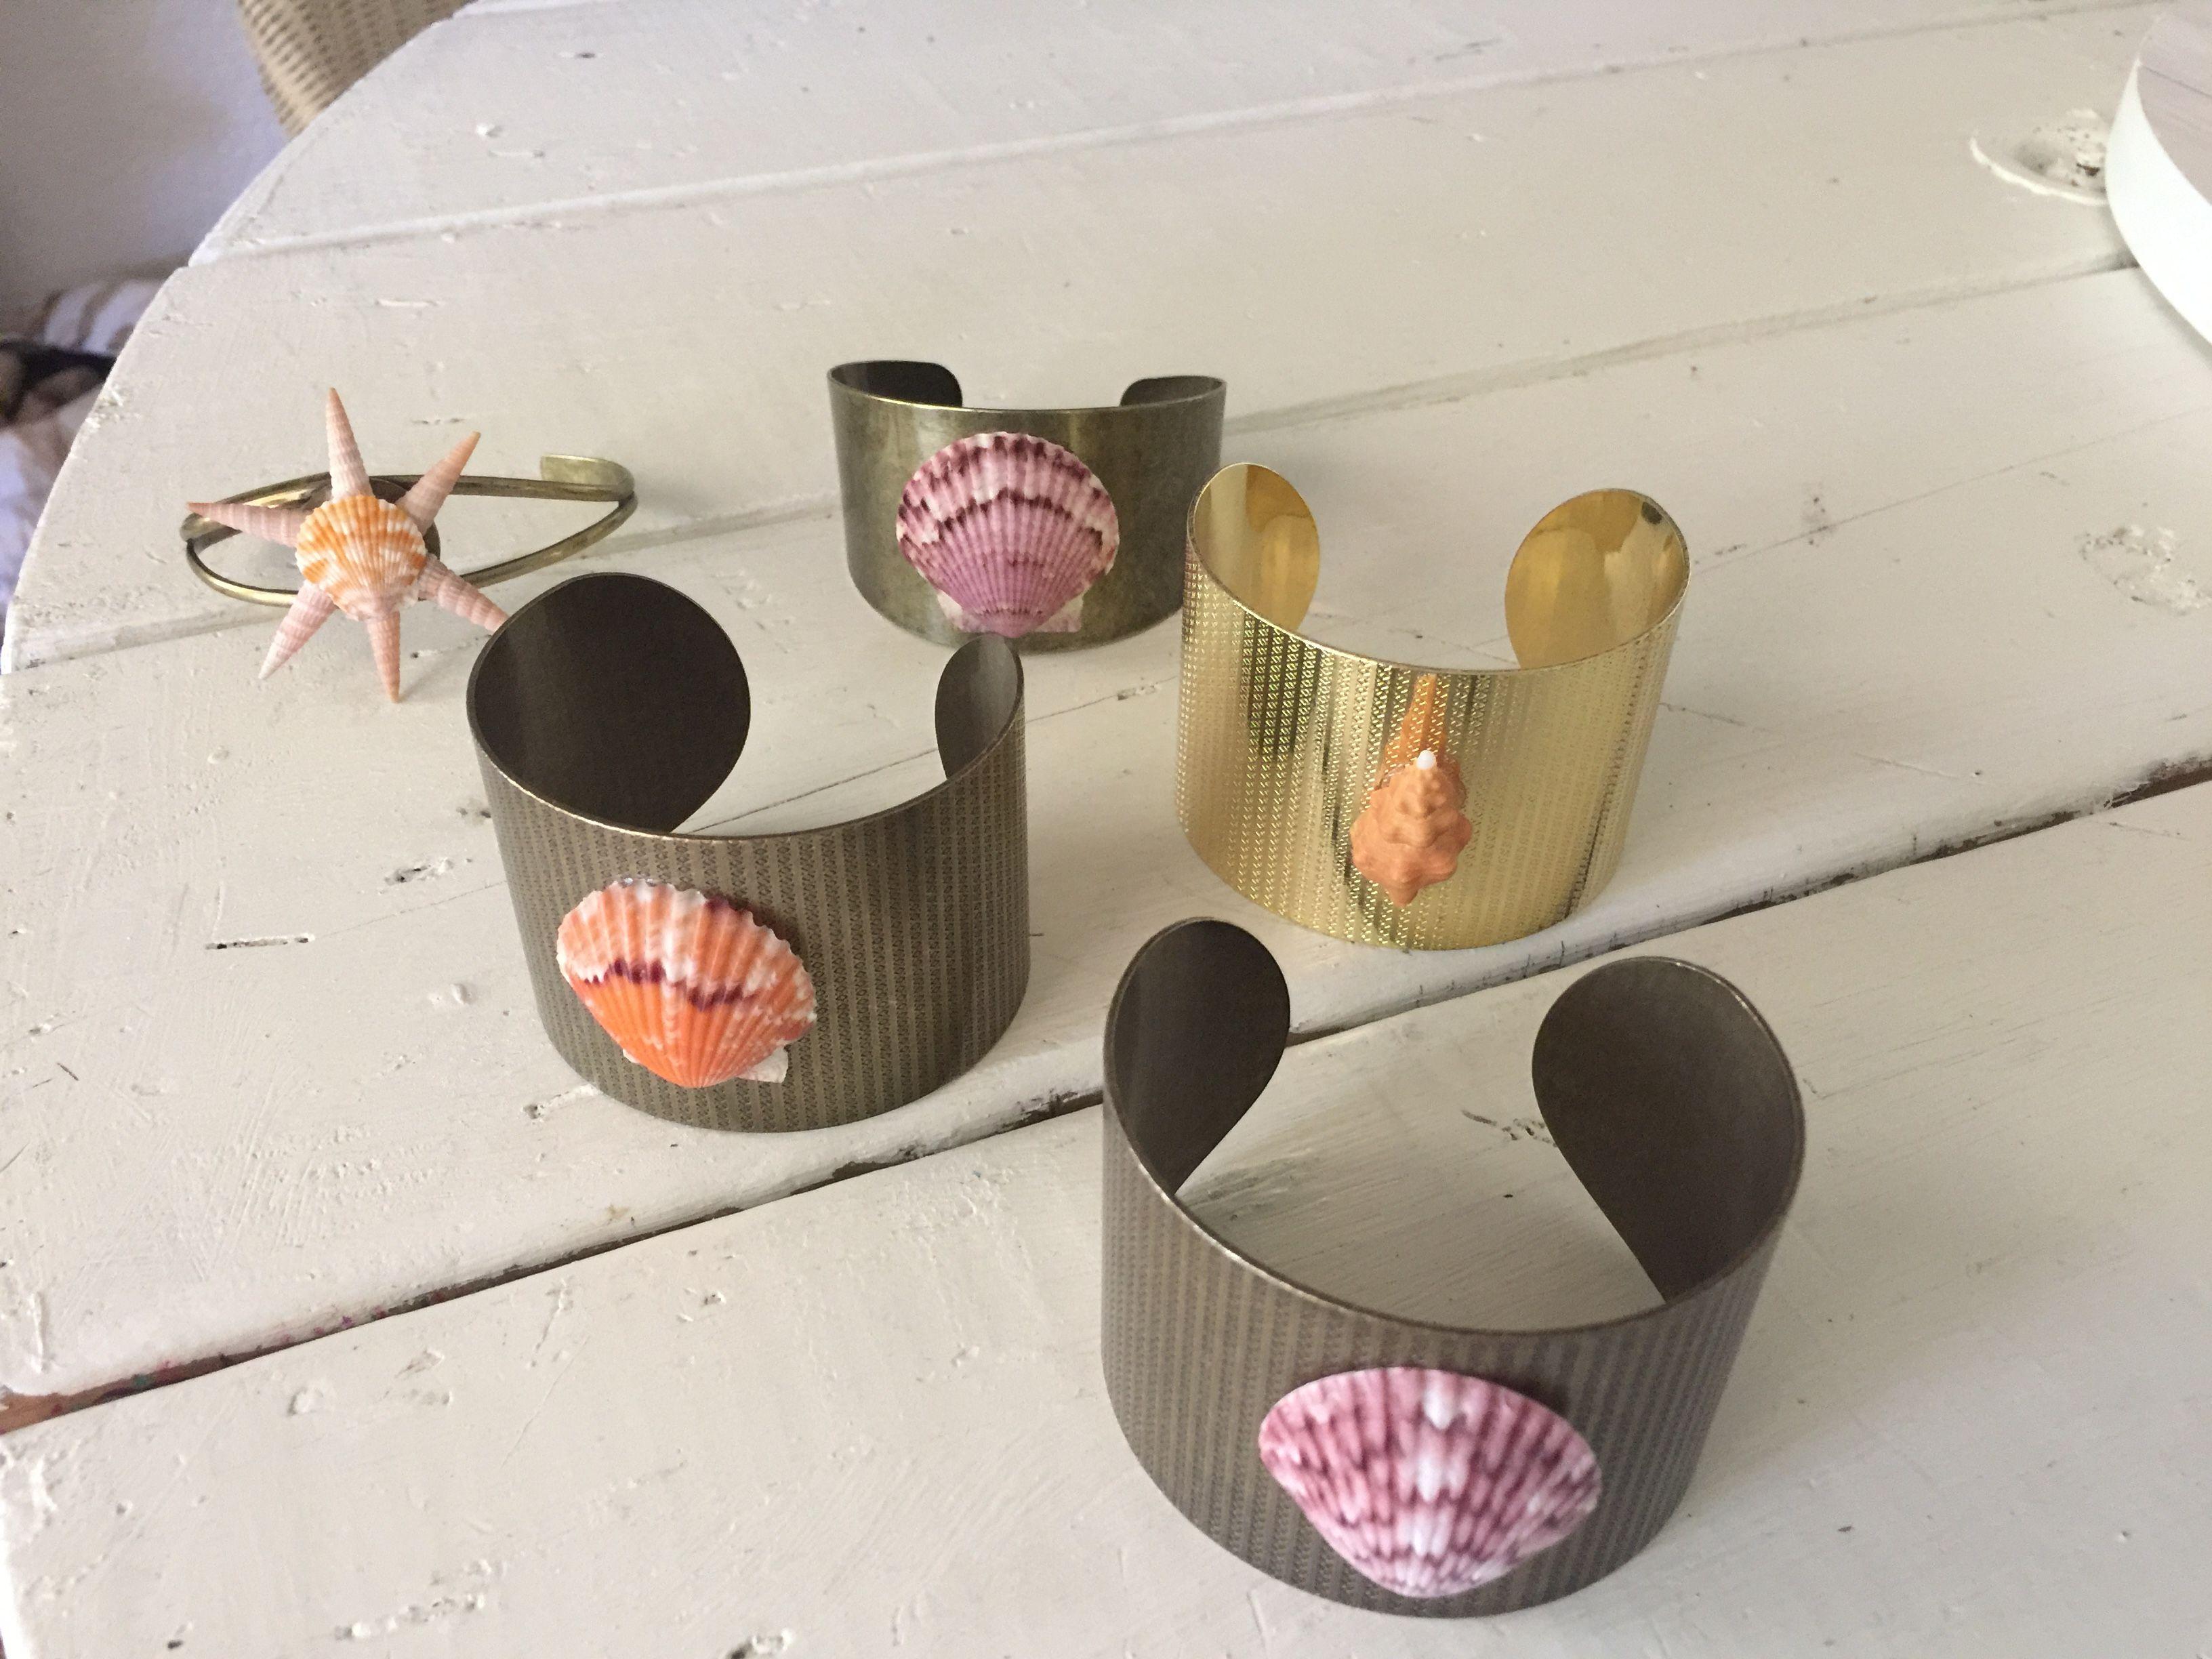 Seashell cuffs. Available on my etsy @CoastalCreations954 Mermaid accessories